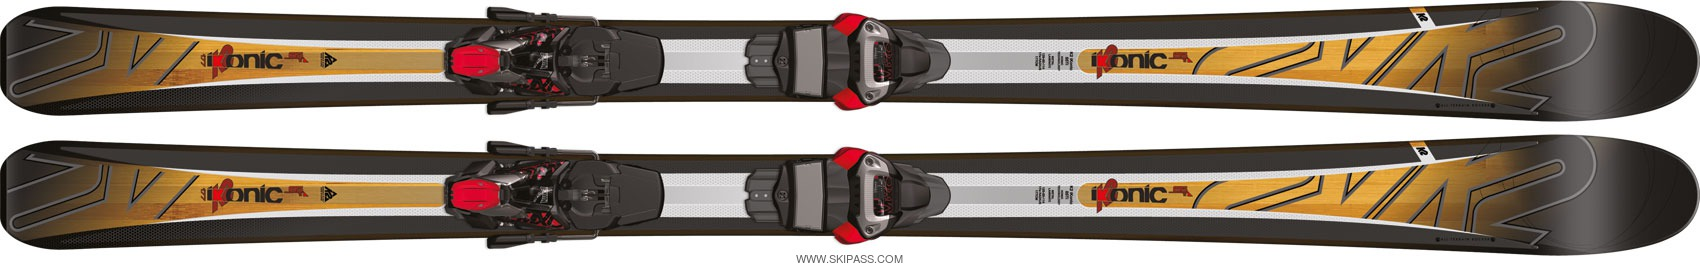 K2 K2 Ikonic 85 TI